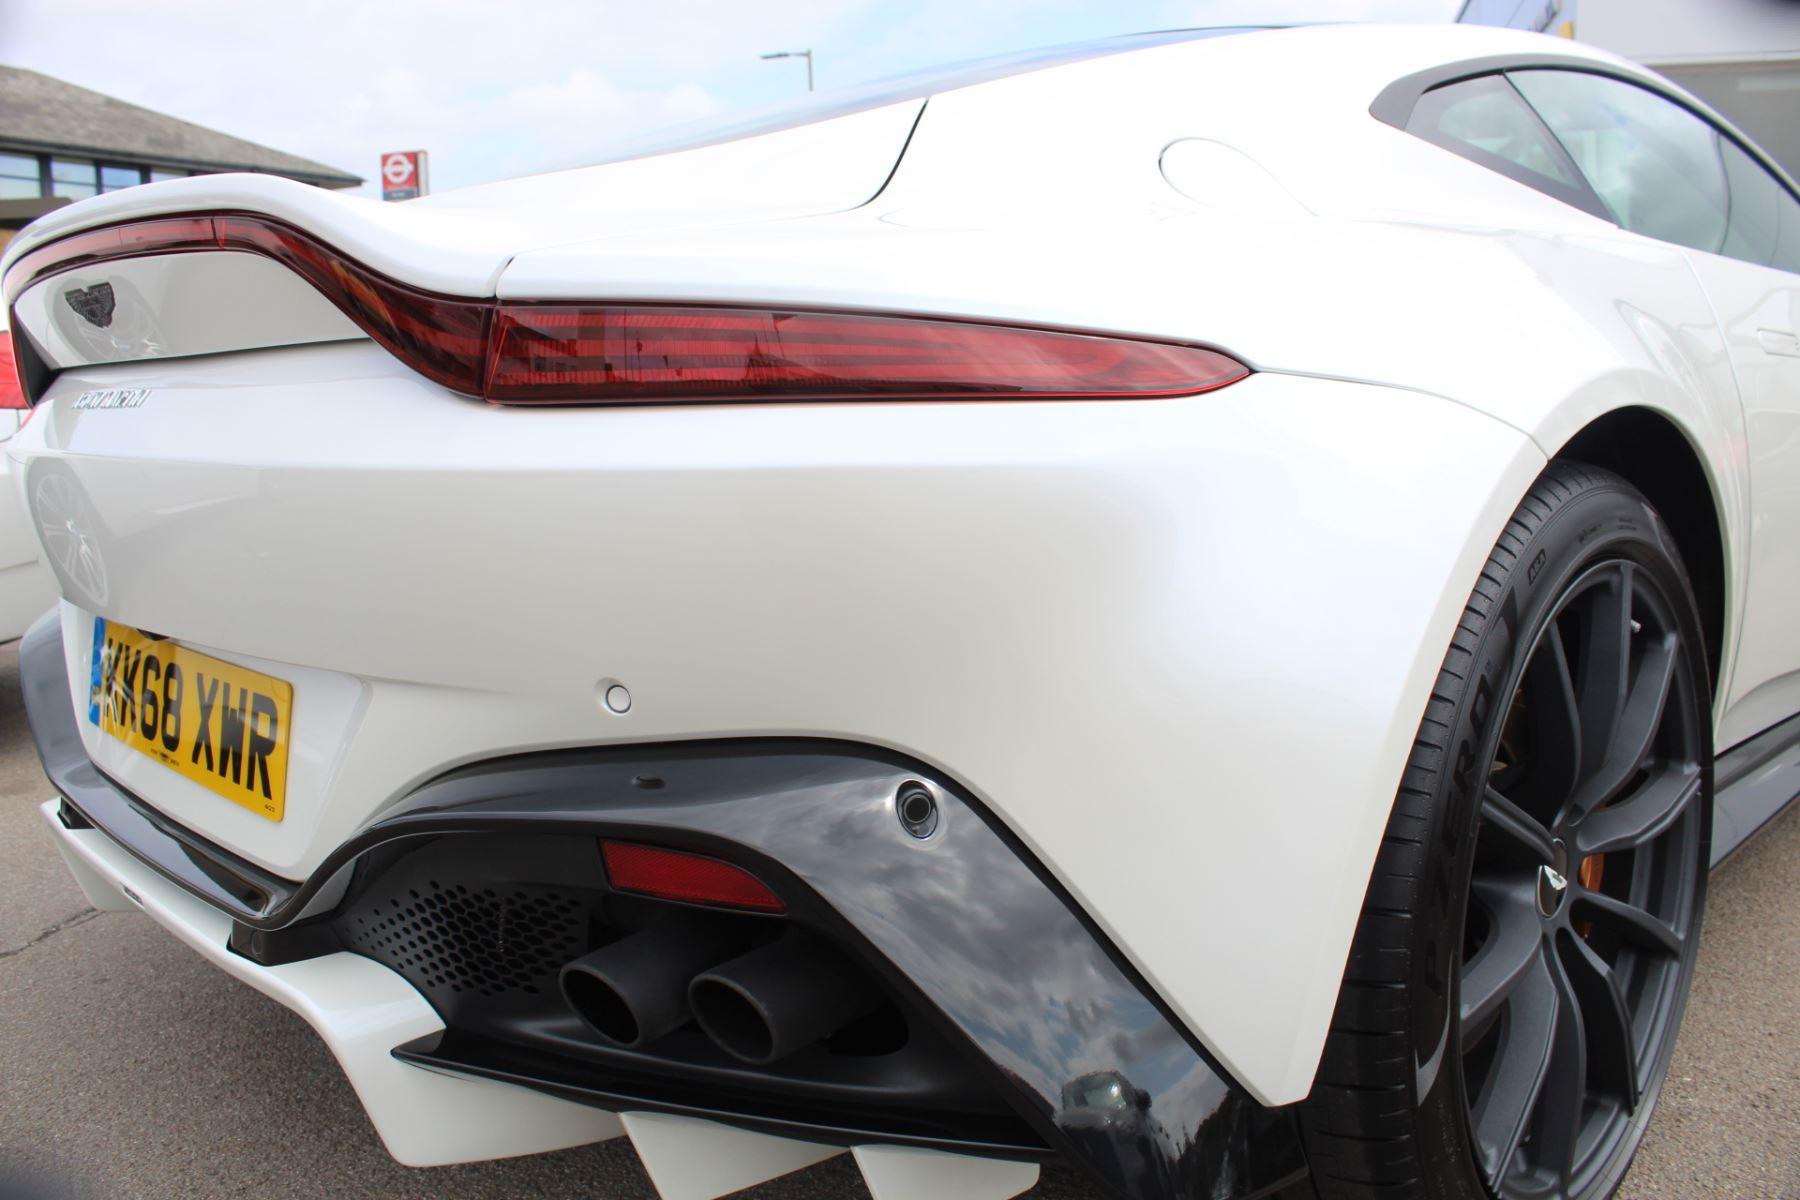 Aston Martin New Vantage 2dr ZF 8 Speed image 19